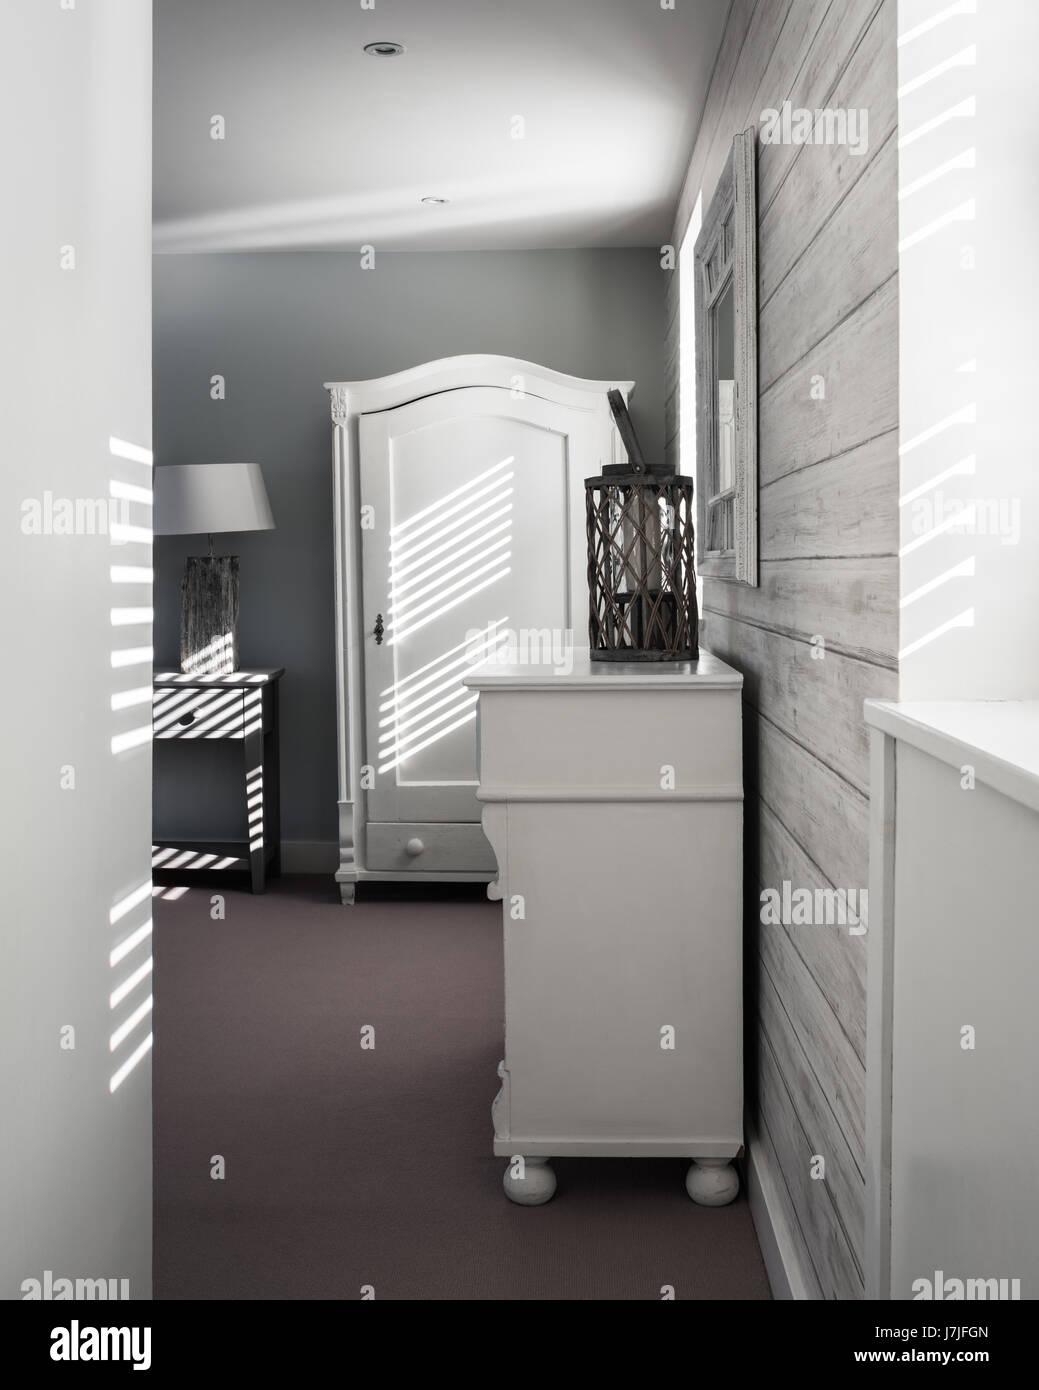 Schlafzimmer Mit Holz Tapete | Holzoptik Tapete Schlafzimmer ...